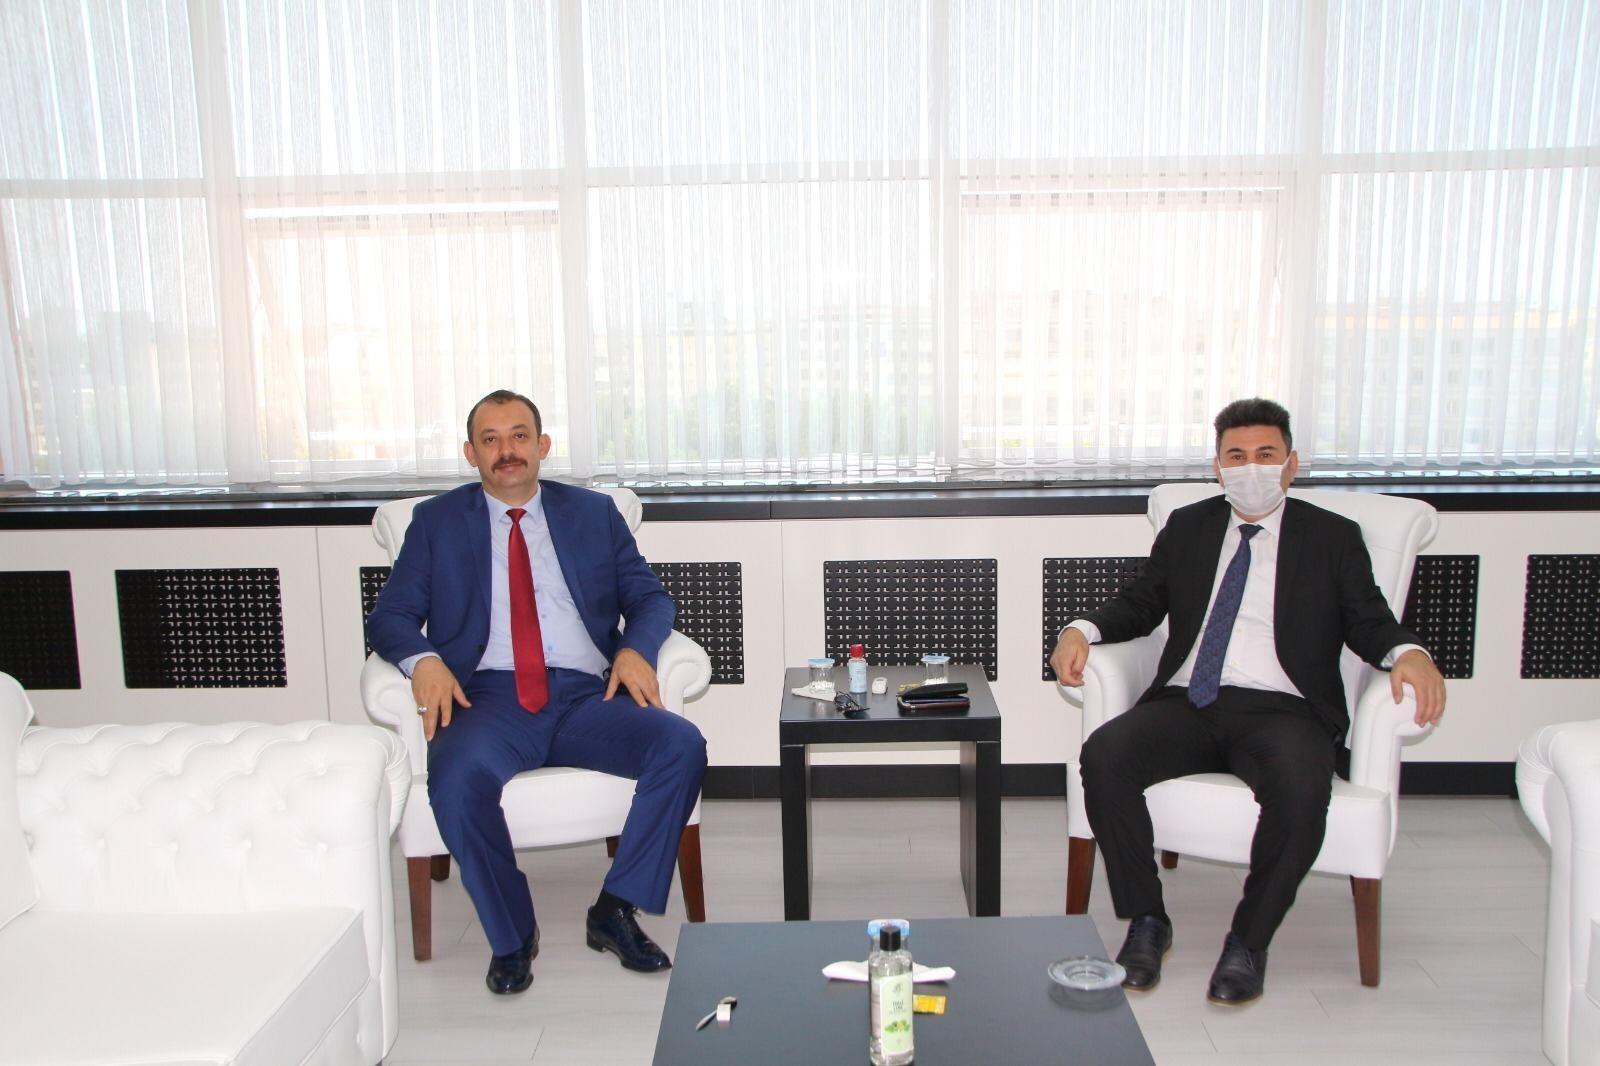 Başsavcı Durmuş'dan Rektör Karacoşkun'a veda ziyareti